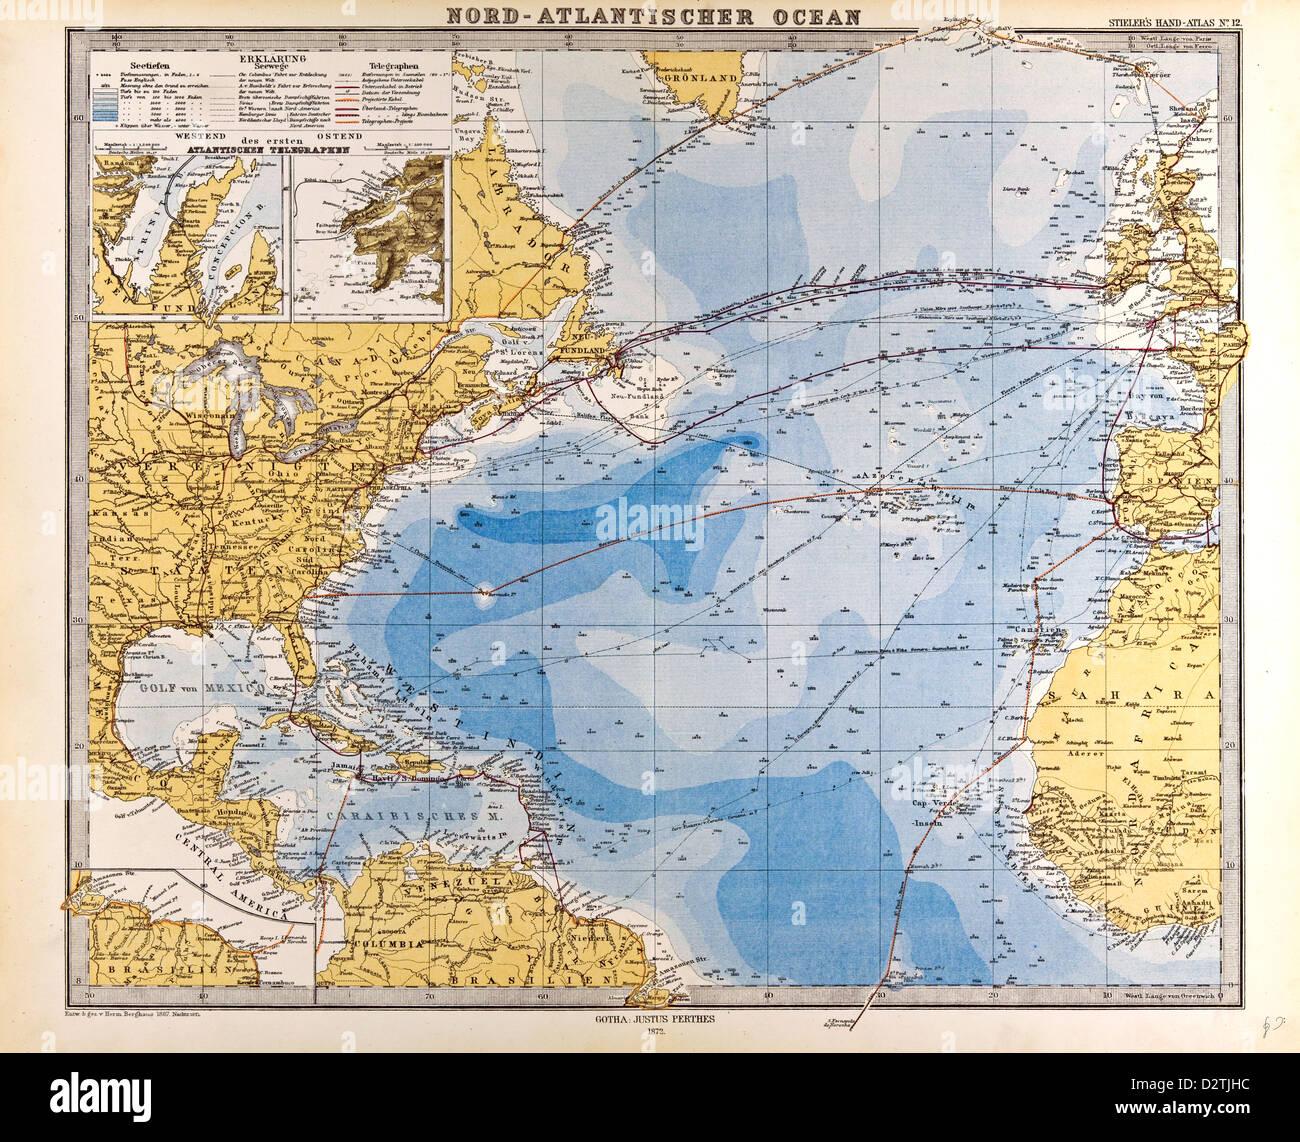 North Atlantic Ocean Map Stock Photos North Atlantic Ocean Map